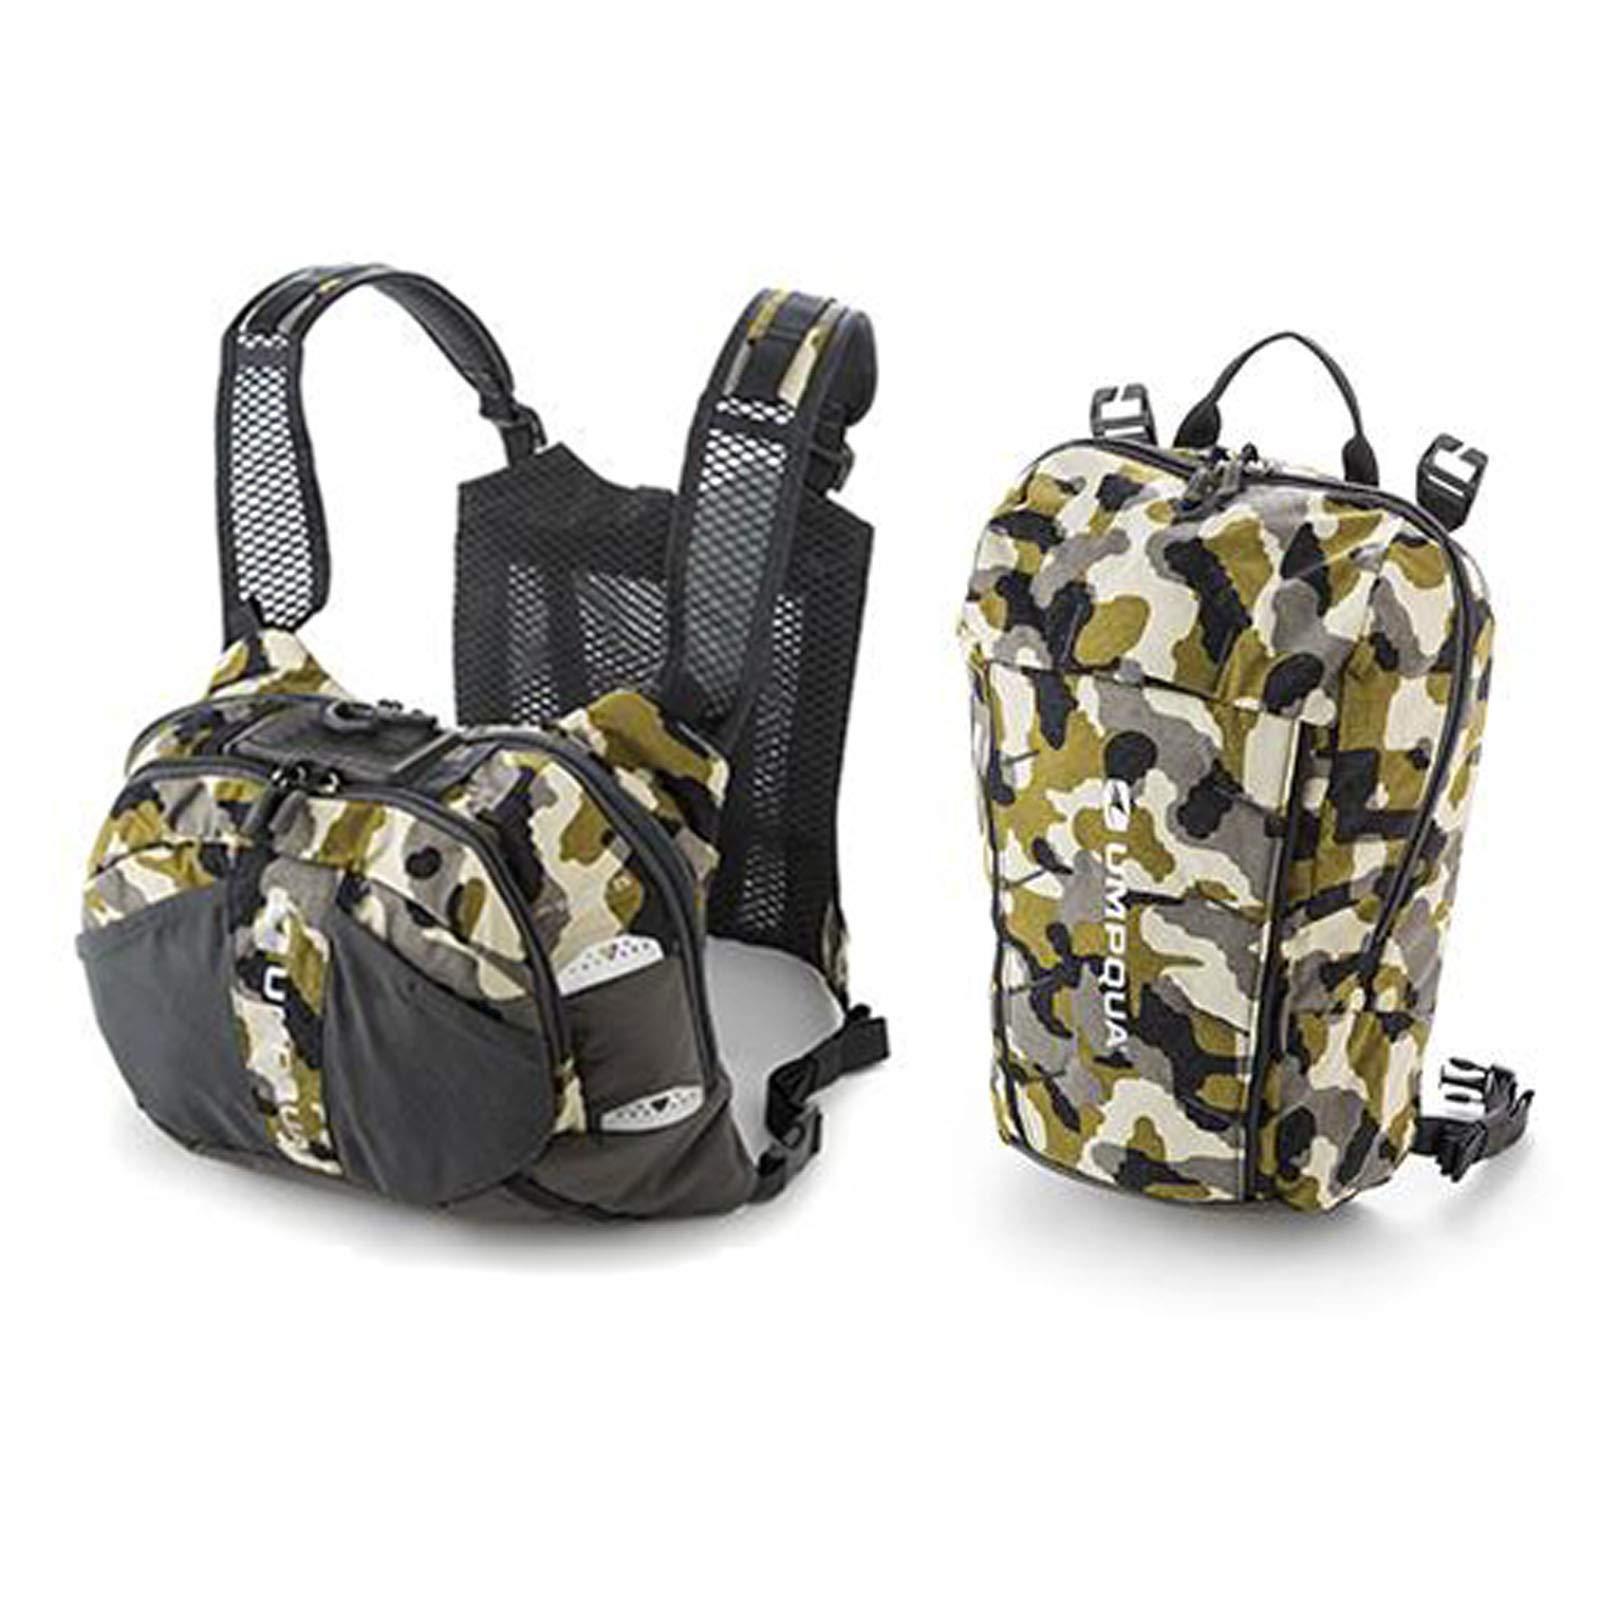 Umpqua Overlook Kit ZS Chest Pack Camo, One Size